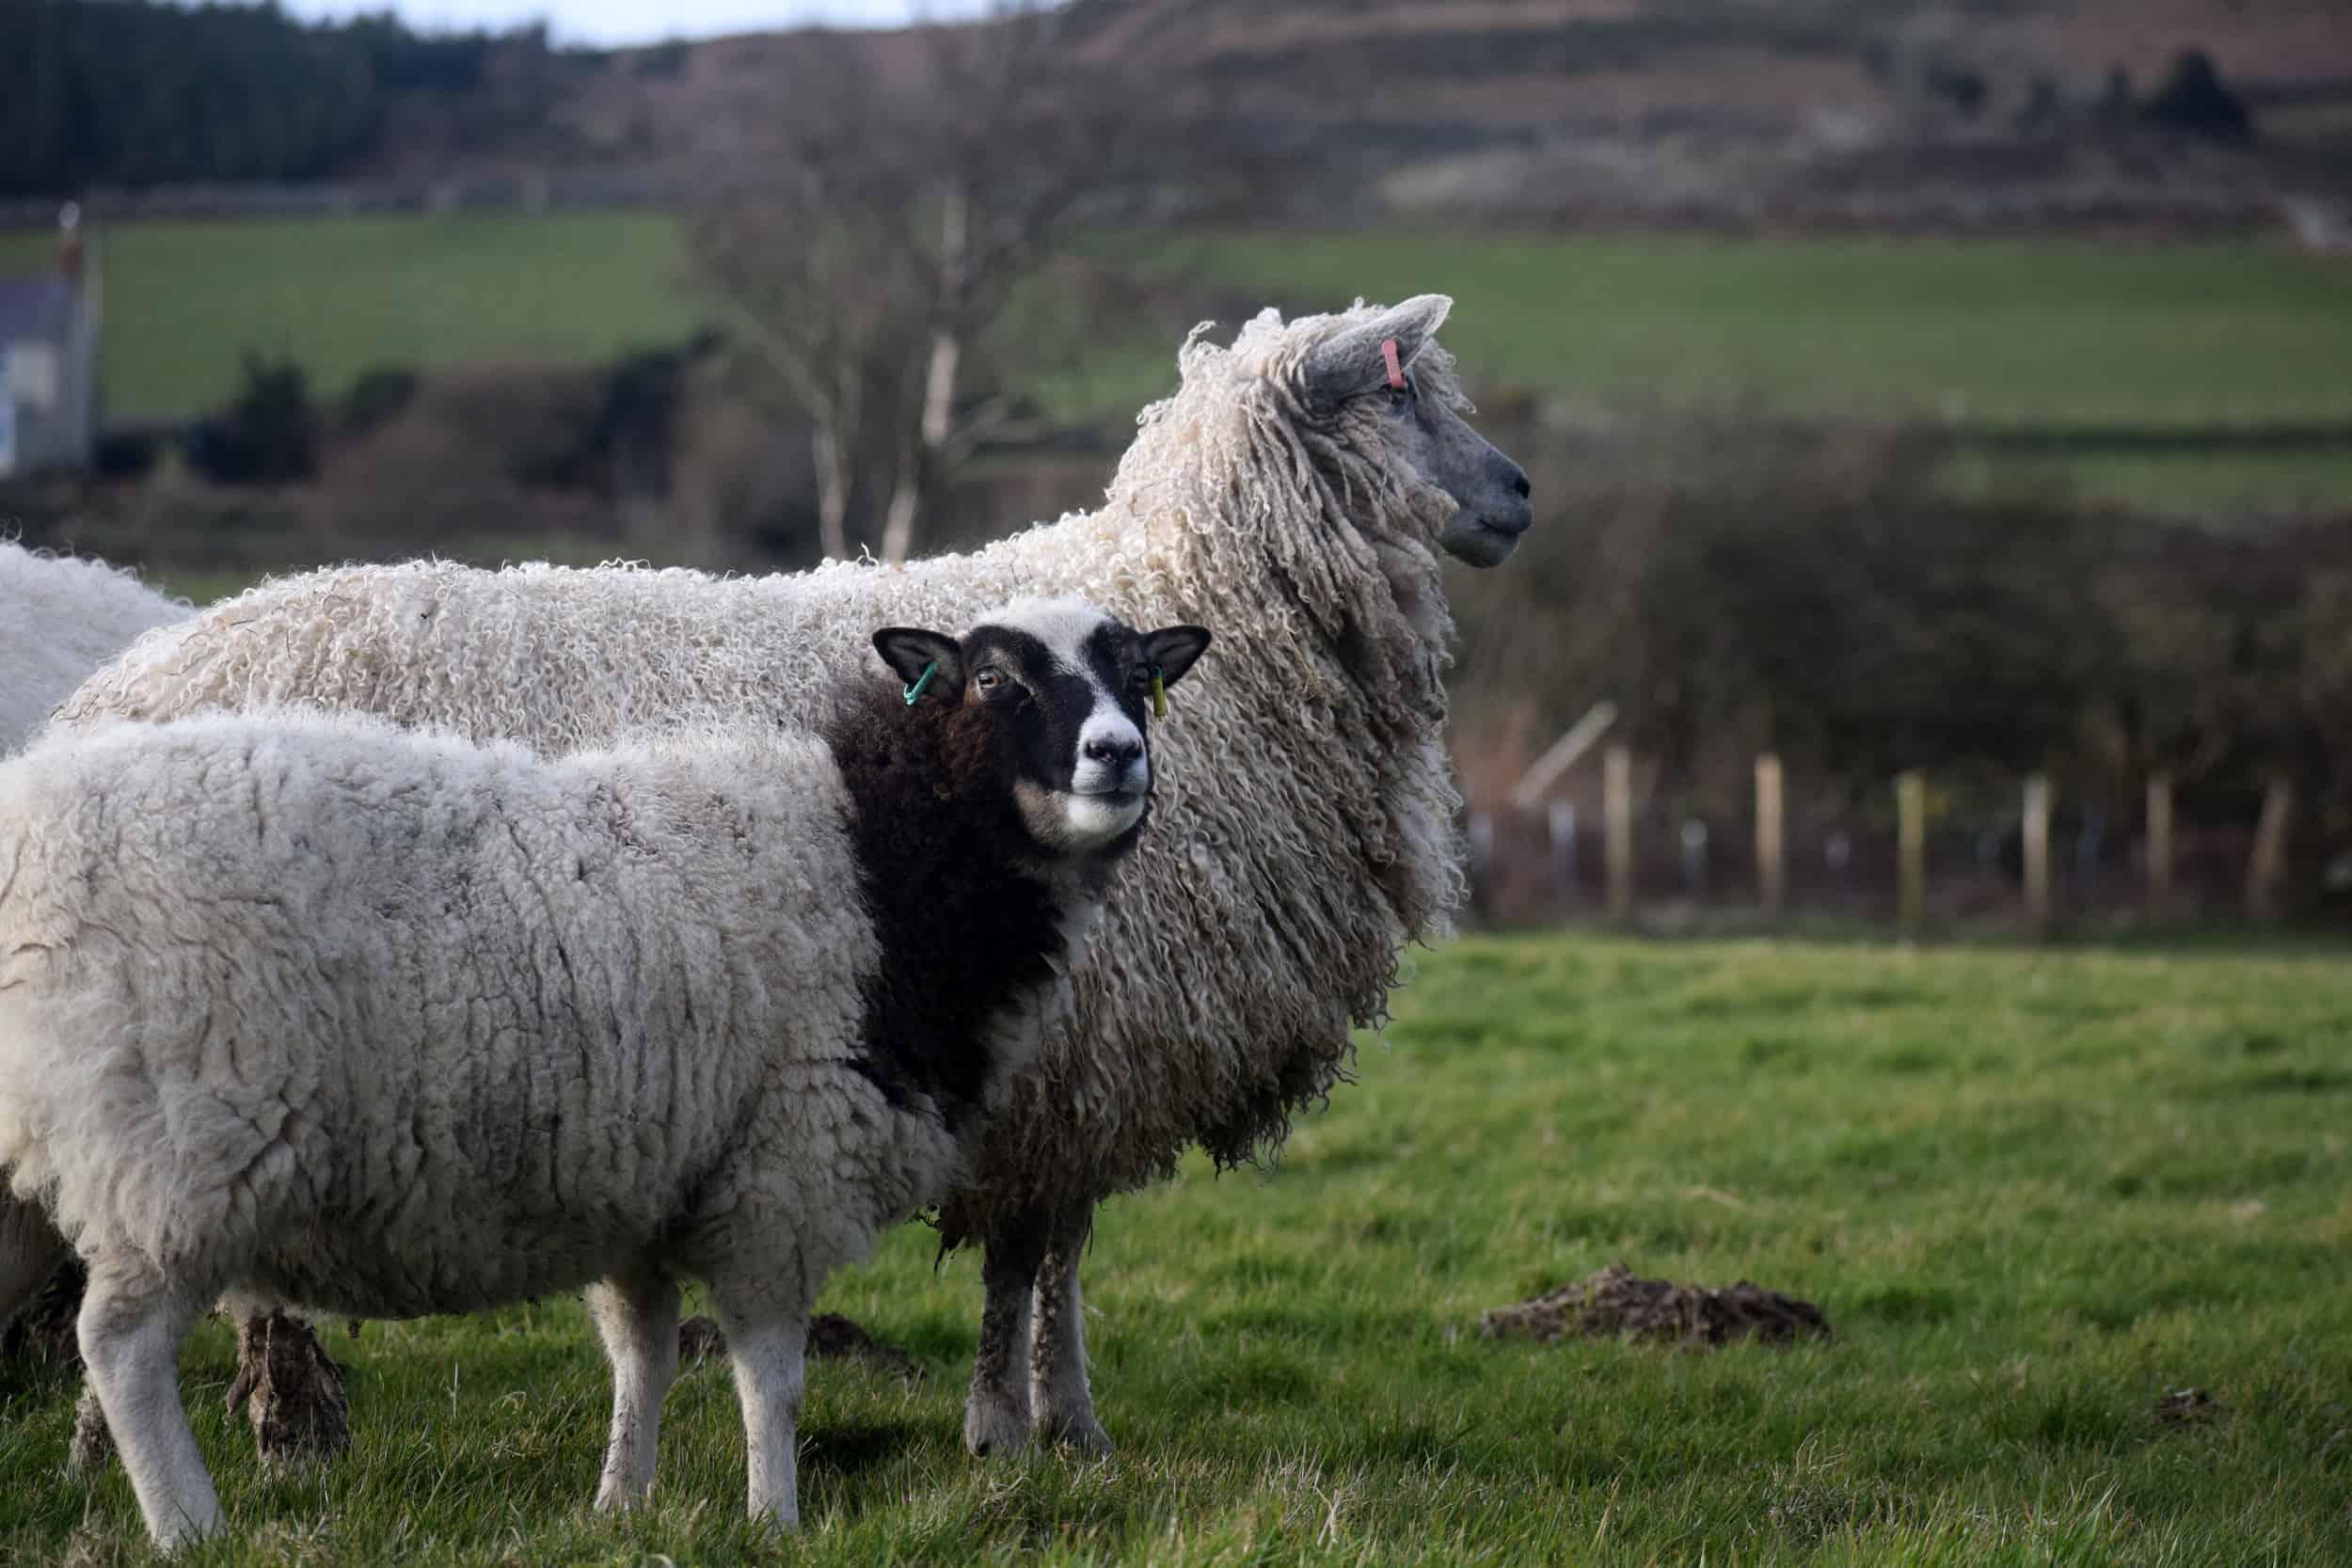 hermione texel x wensleydale patchwork sheep 5